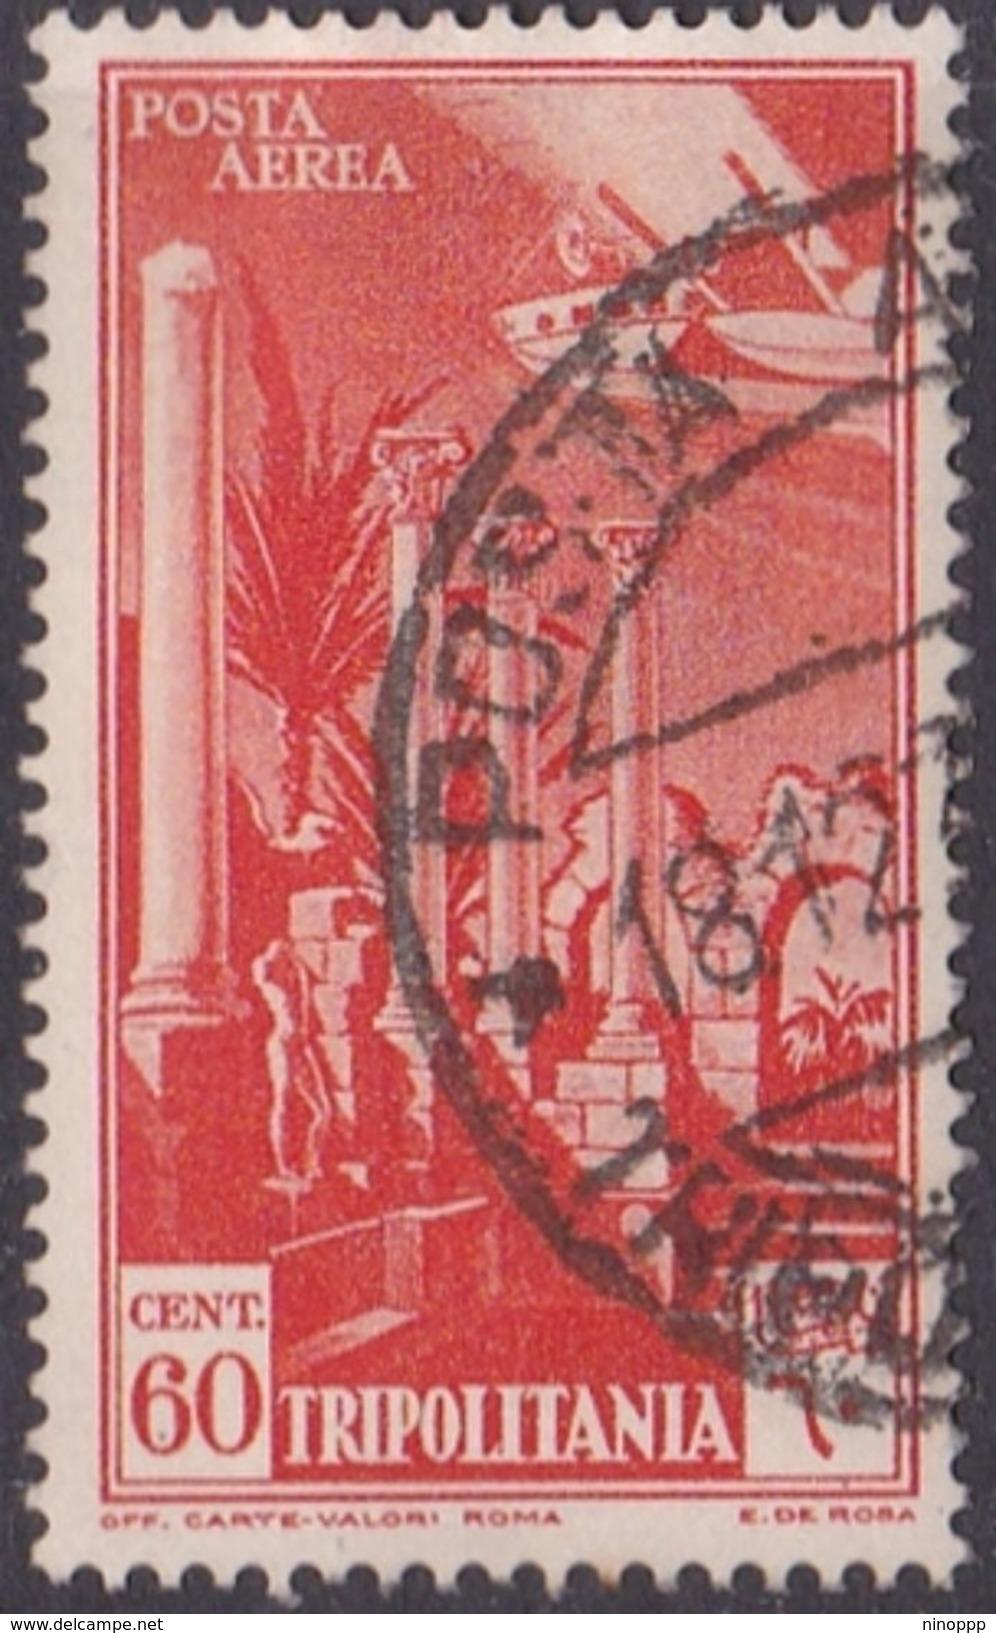 Italy-Colonies And Territories-Tripolitania A10  1931 Air Leptis Magna Ruines,60c Orange,used - Tripolitania